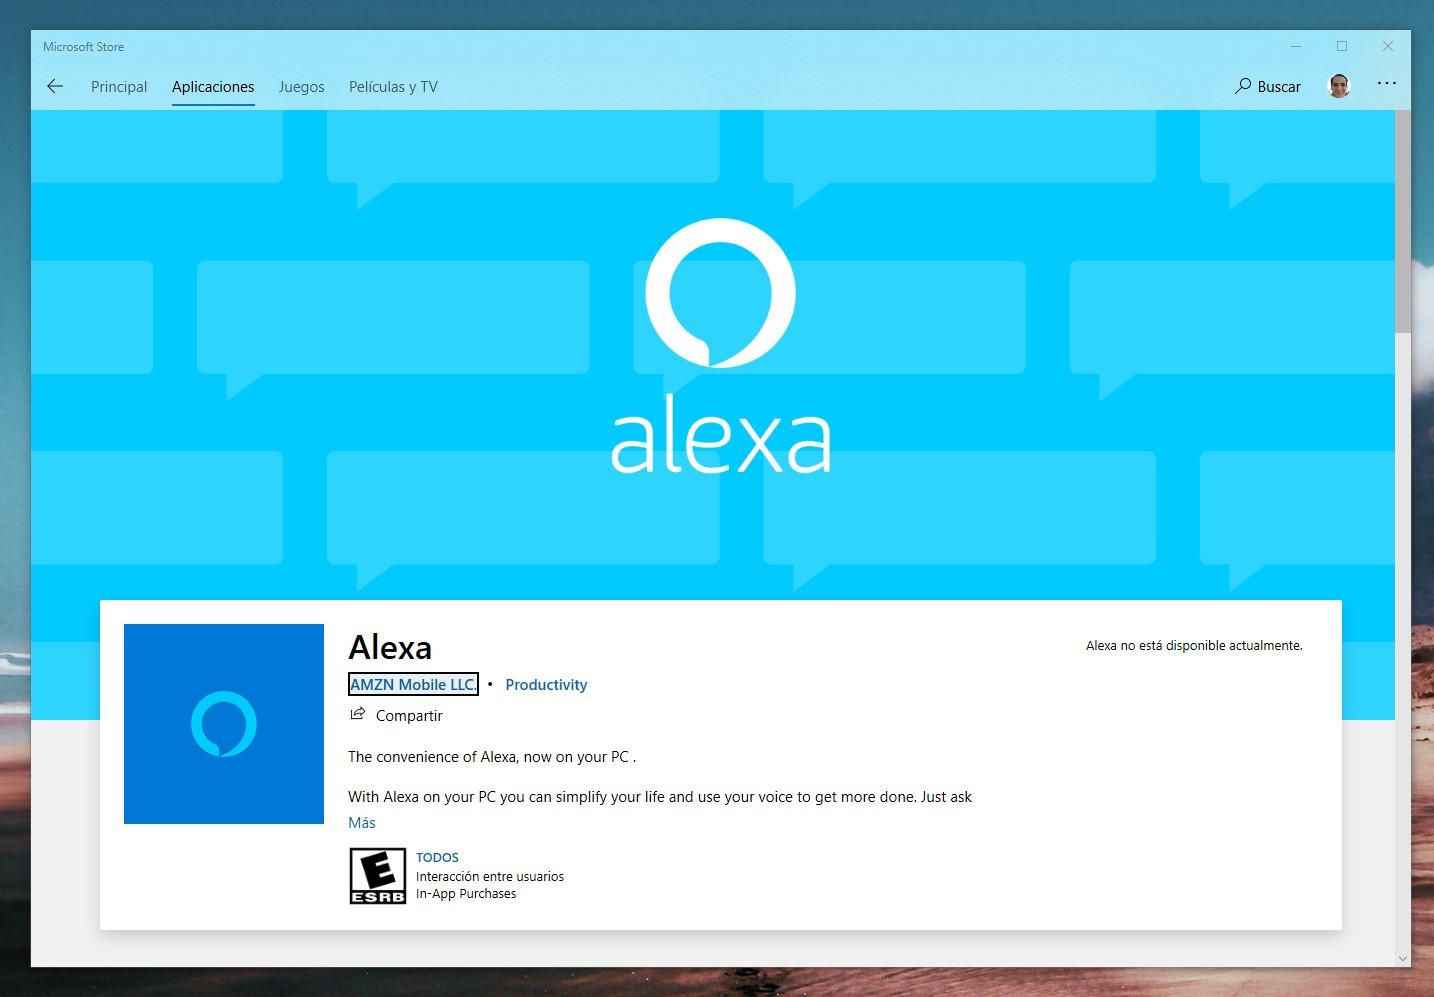 Como usar Alexa en tu PC con Windows 10 • Intergalaxia